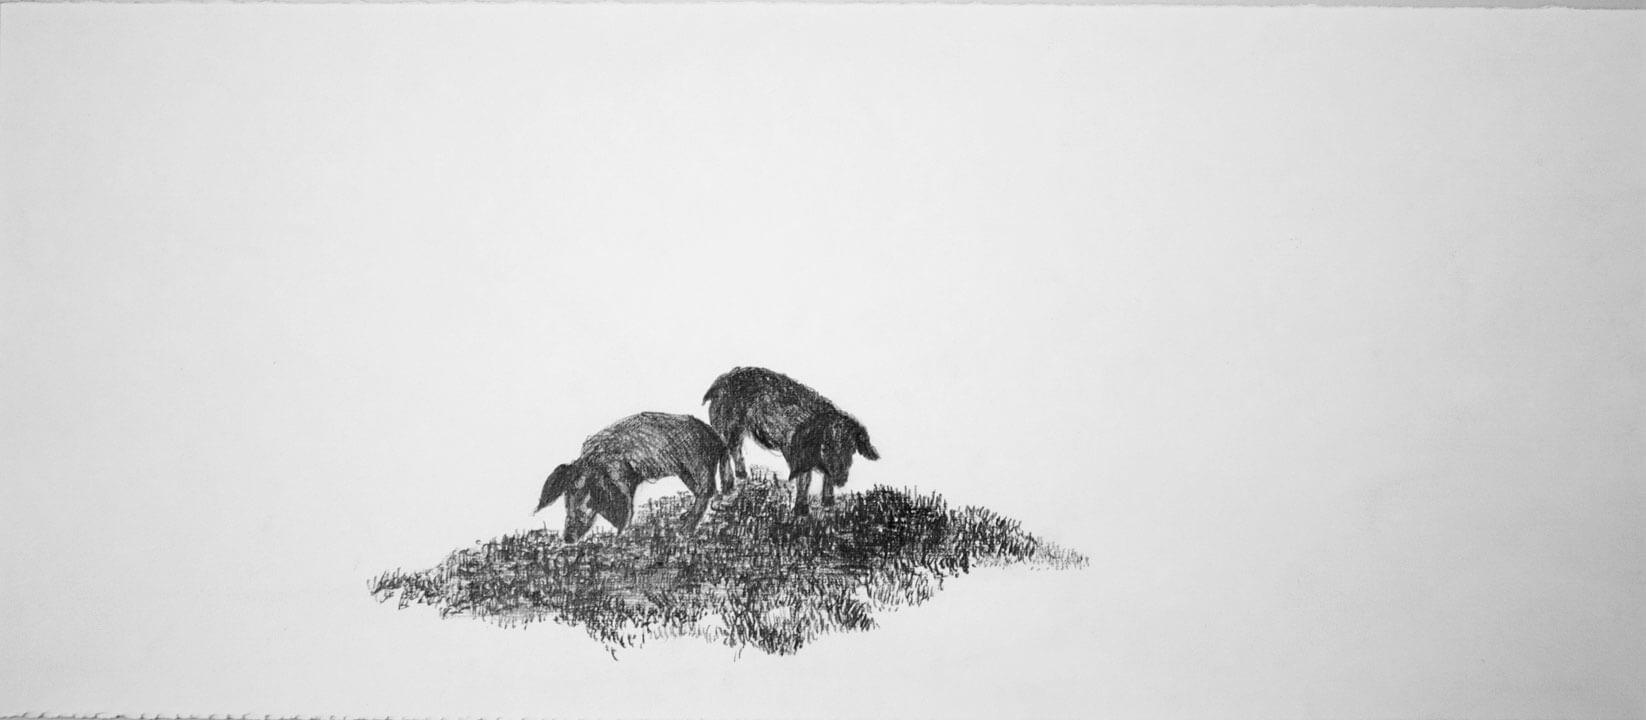 Lilliput, graphite on cotton paper, 20 x 49 cm., 2007.